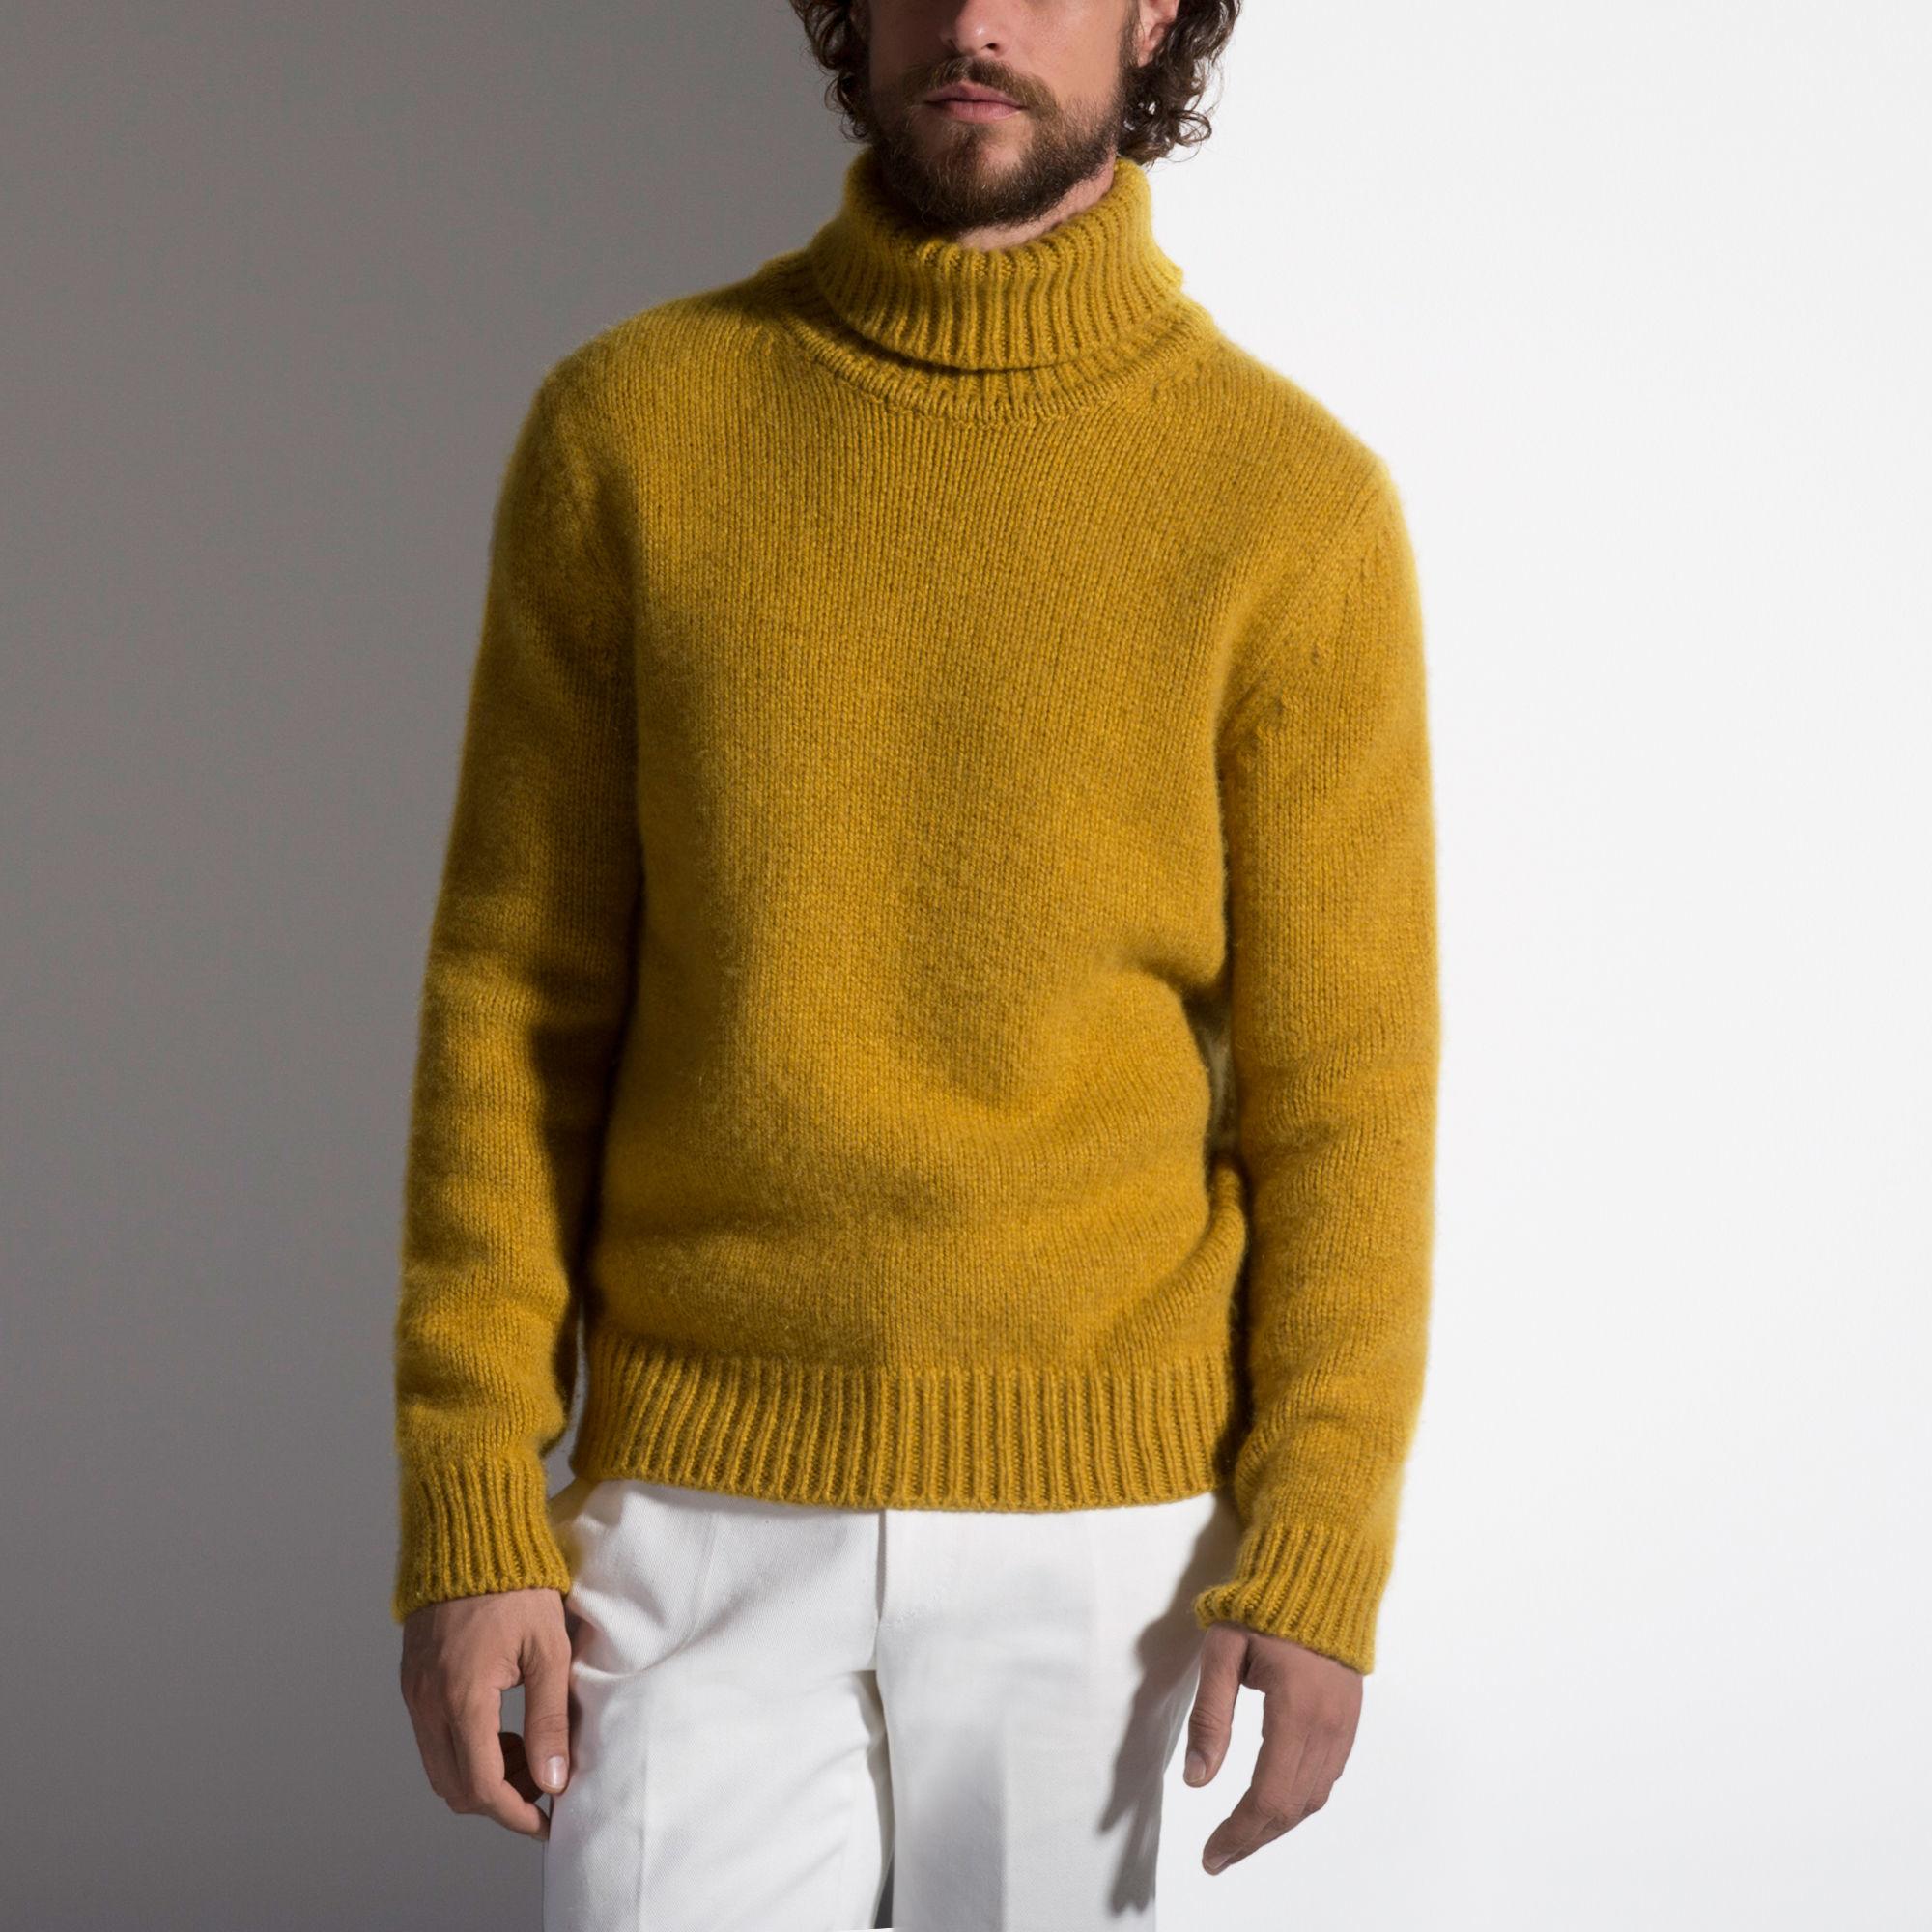 Michael Simon Sweater